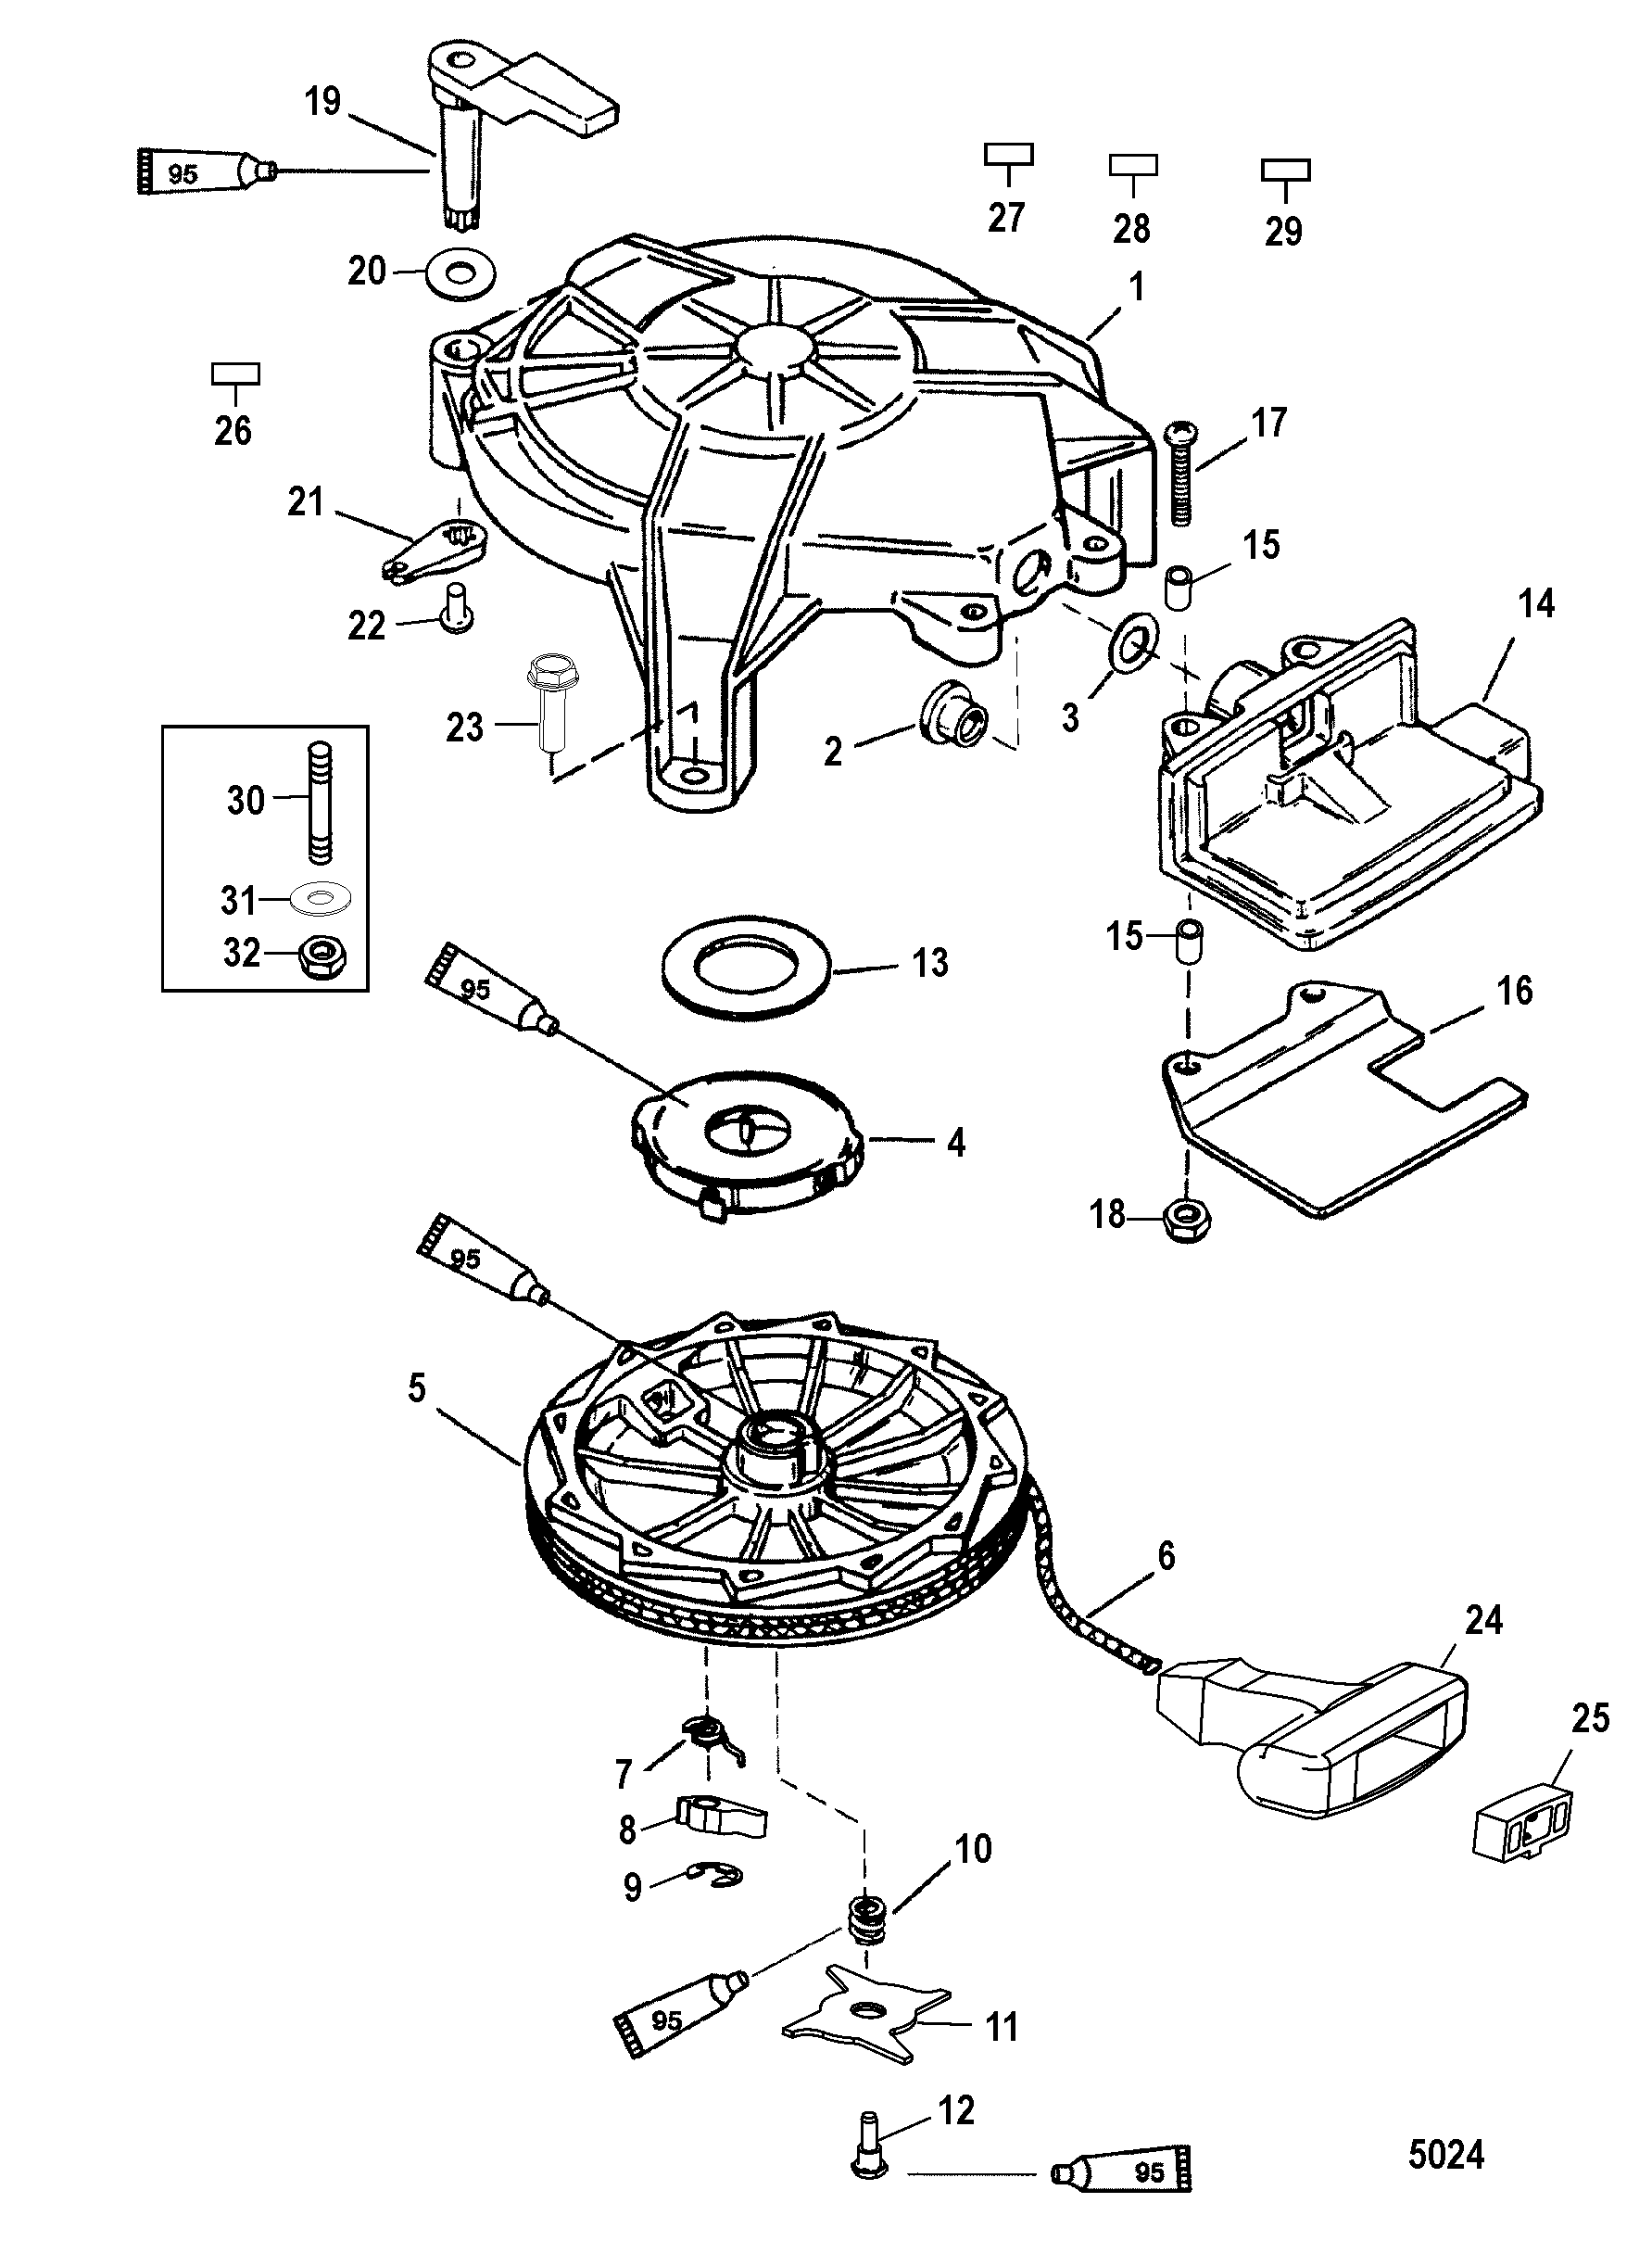 Manual Starter For Mariner Mercury 10 15 Seapro Marathon